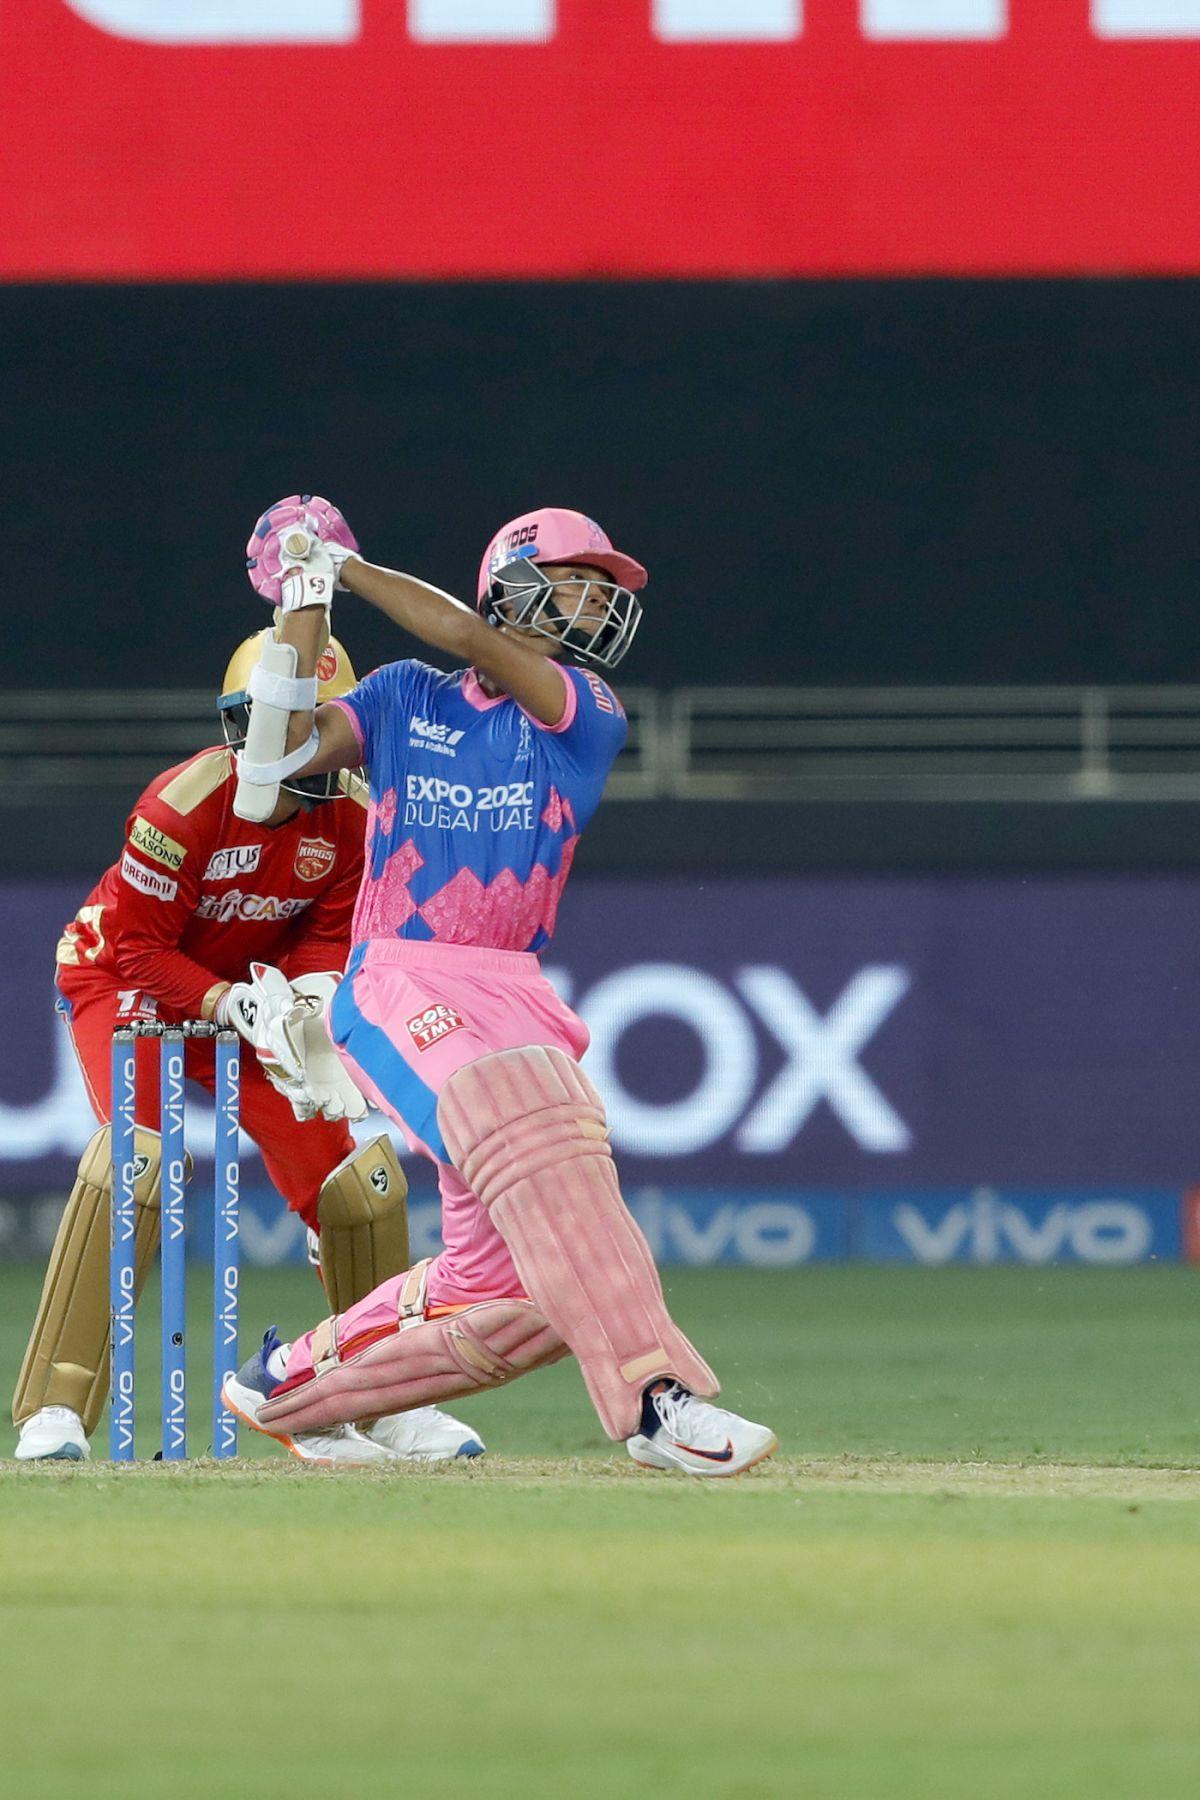 Yashasvi Jaiswal goes inside out over the off side, Punjab Kings vs Rajasthan Royals, IPL 2021, Dubai, September 21, 2021